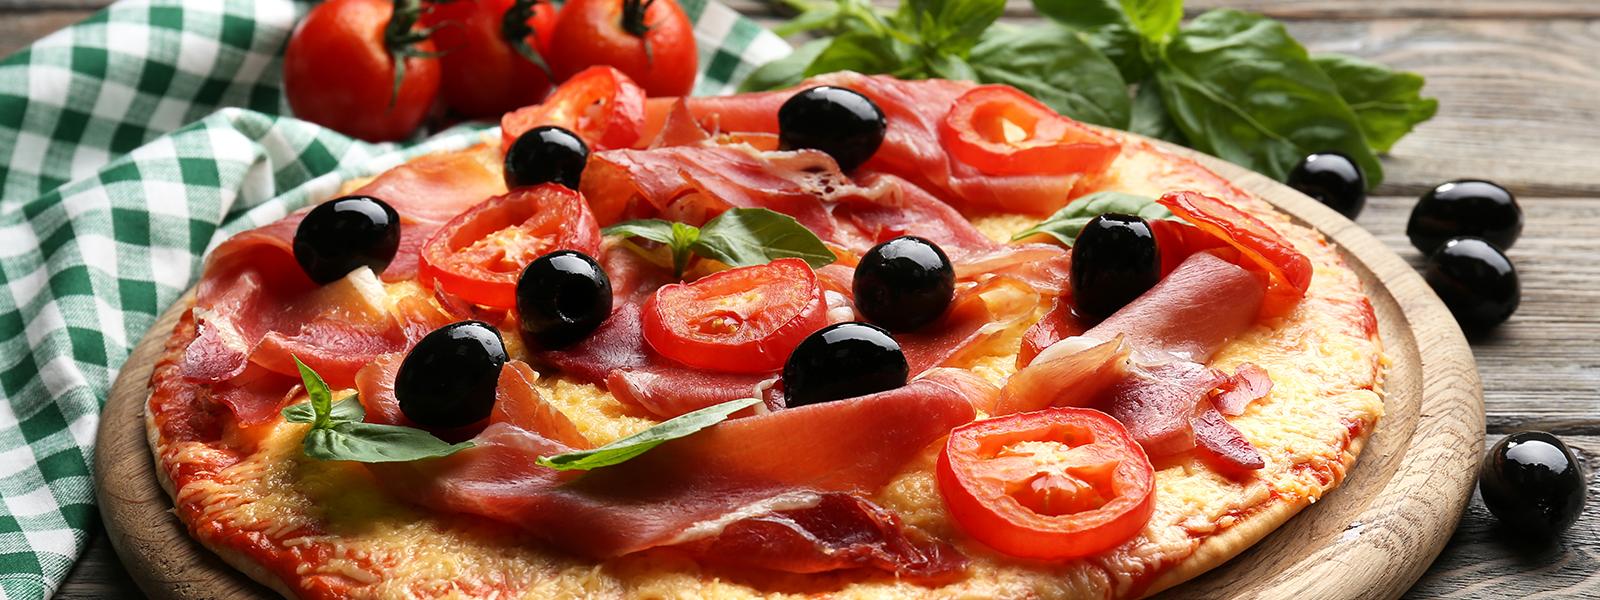 Pizzalicious Simply Kebab Gr8south Ltd Pizzalicious